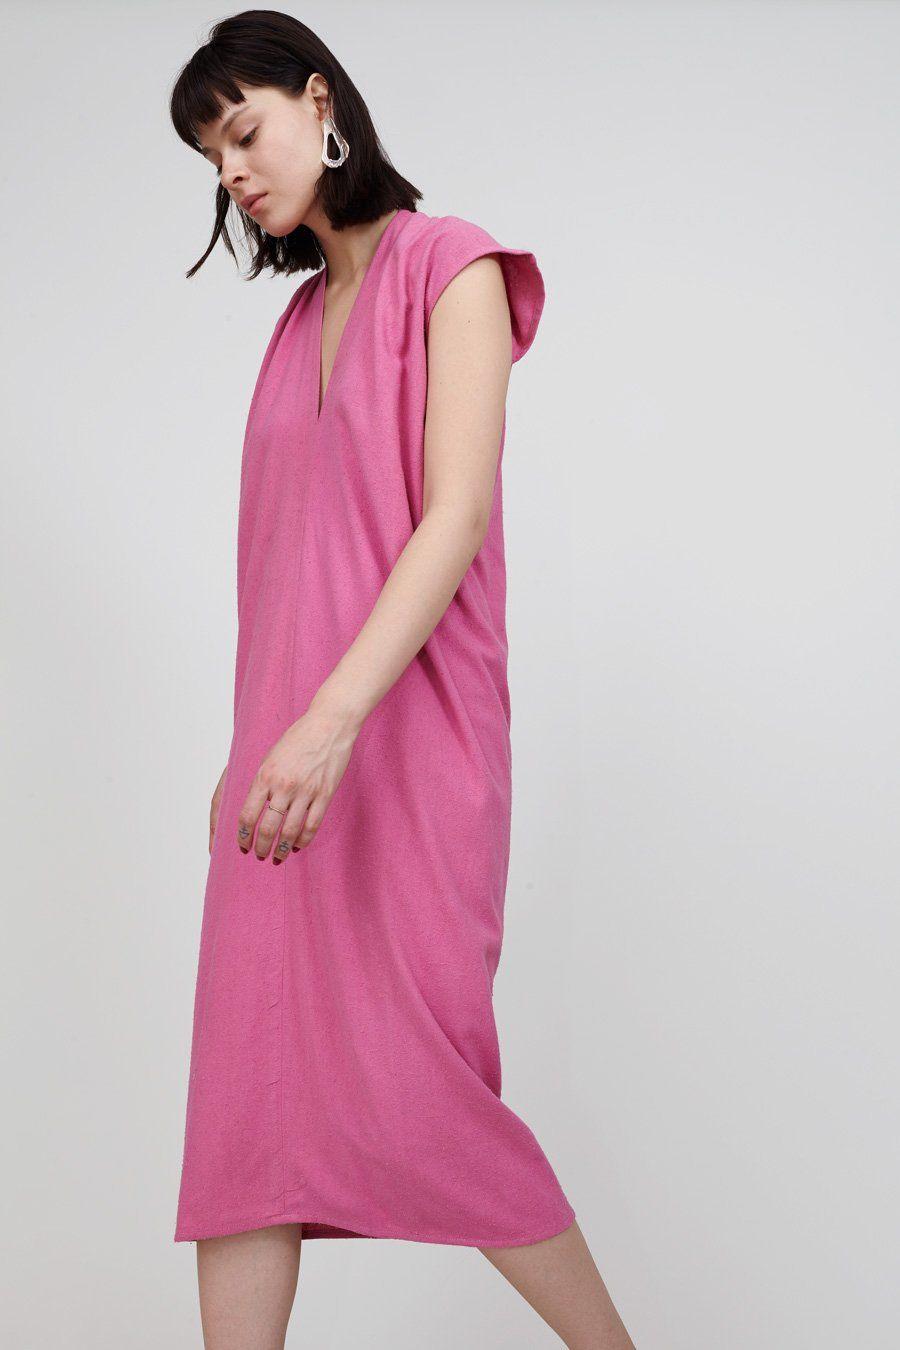 Miranda Bennett Everyday Dress Long in Rio Silk Noil | Everyday ...